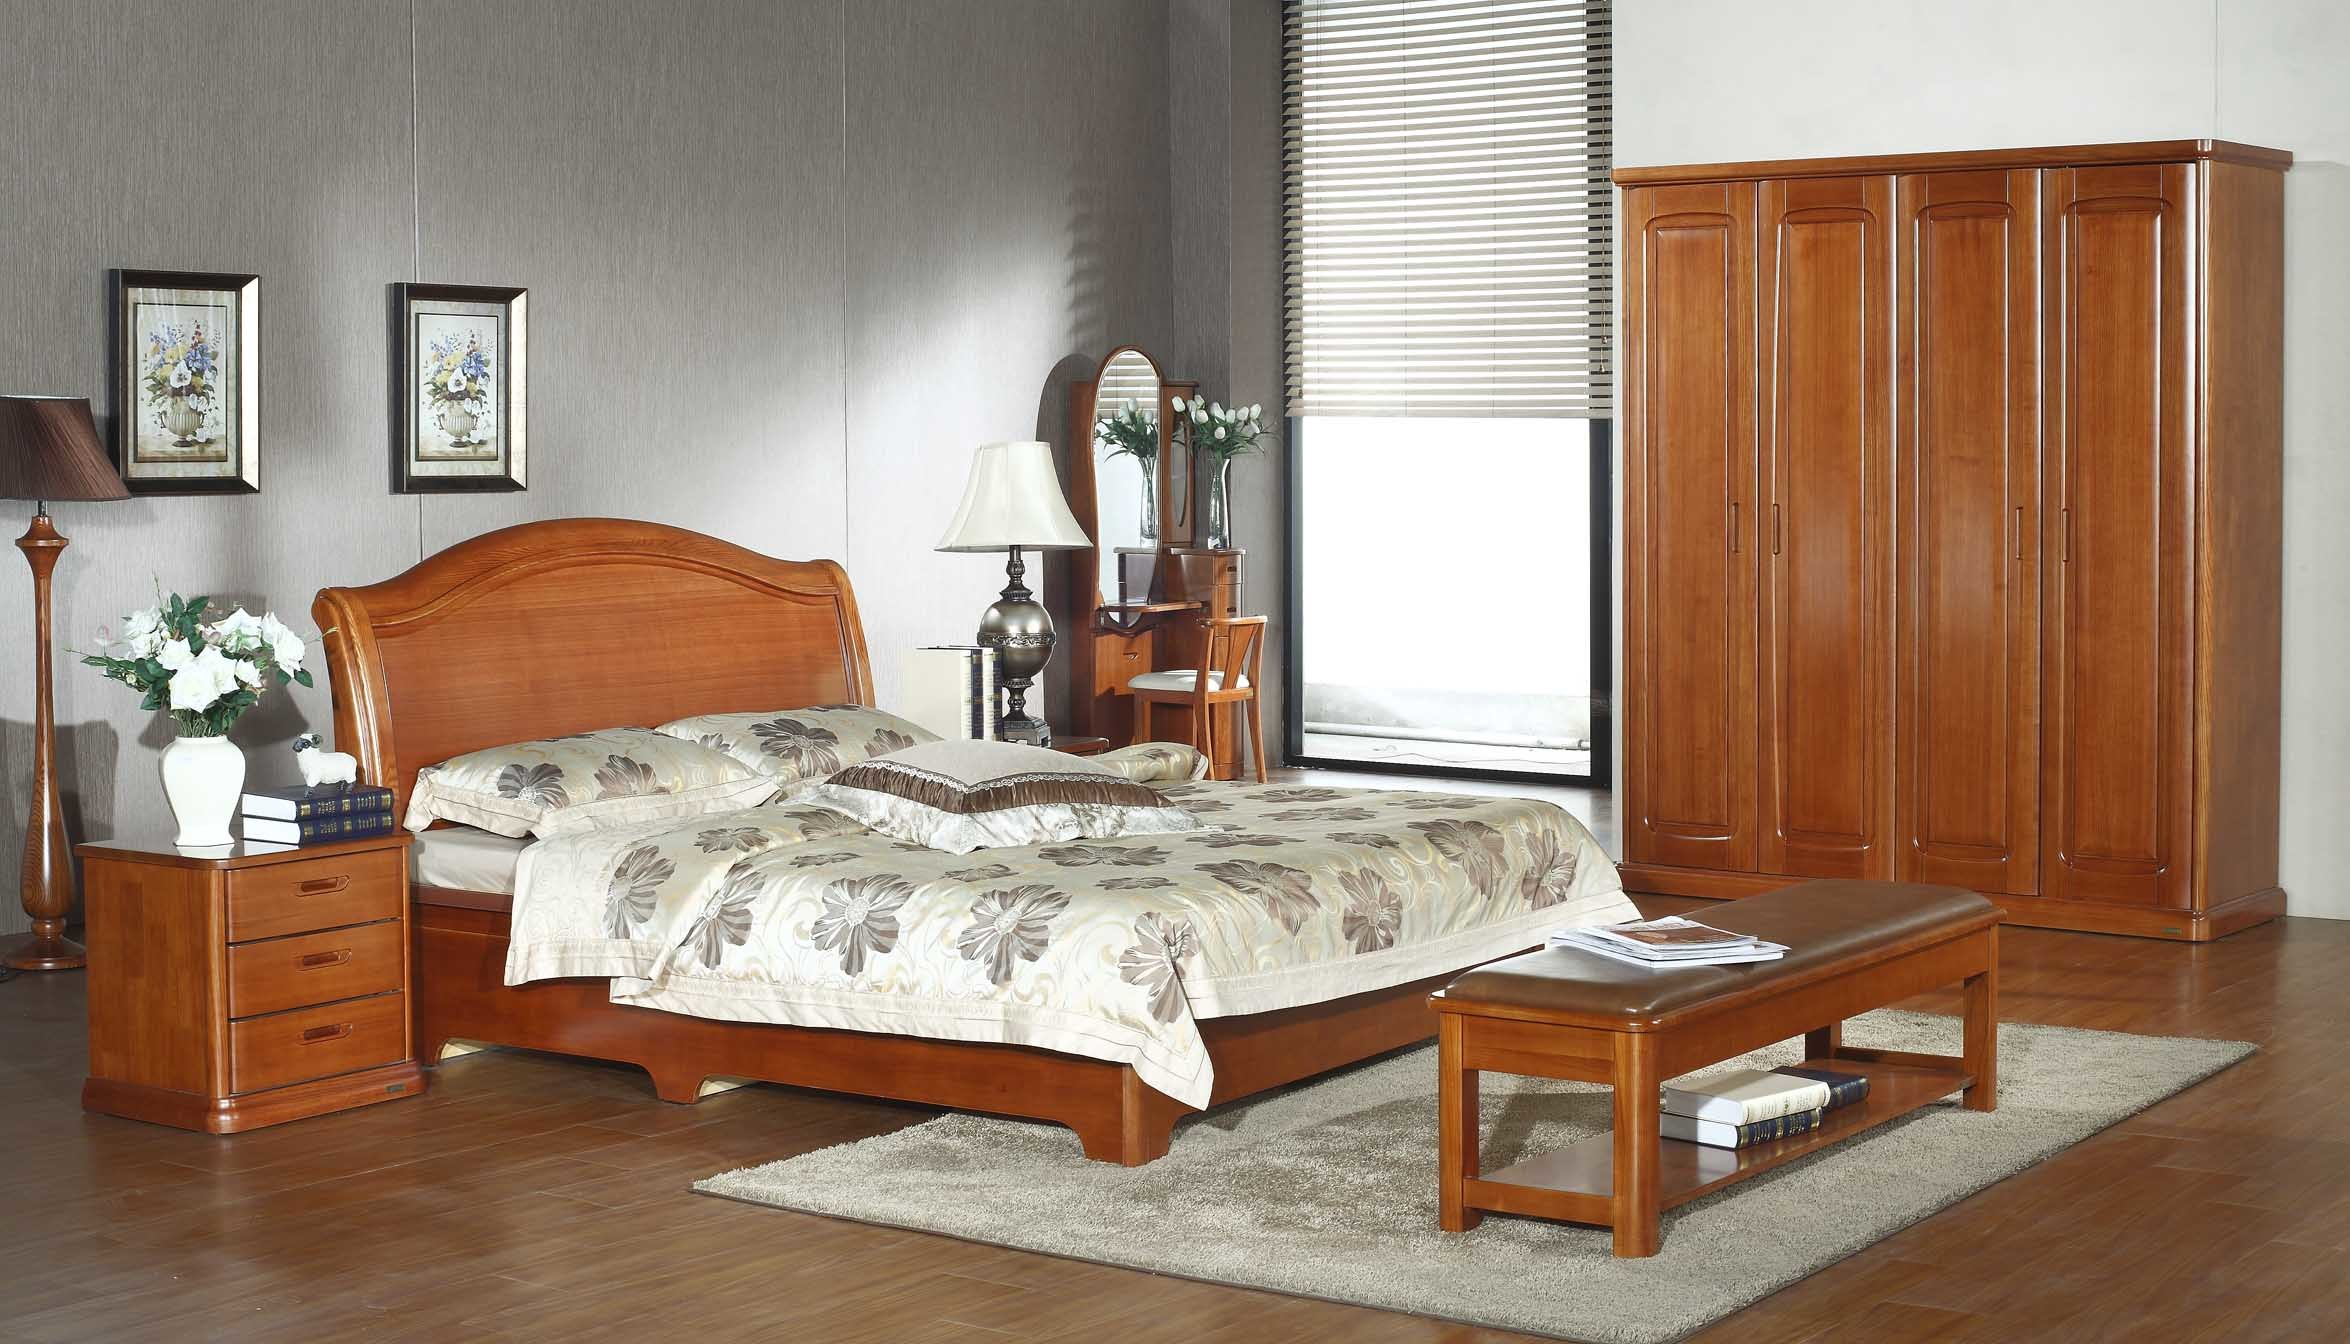 Temperature chambre a coucher maison design for Meuble chambre a coucher